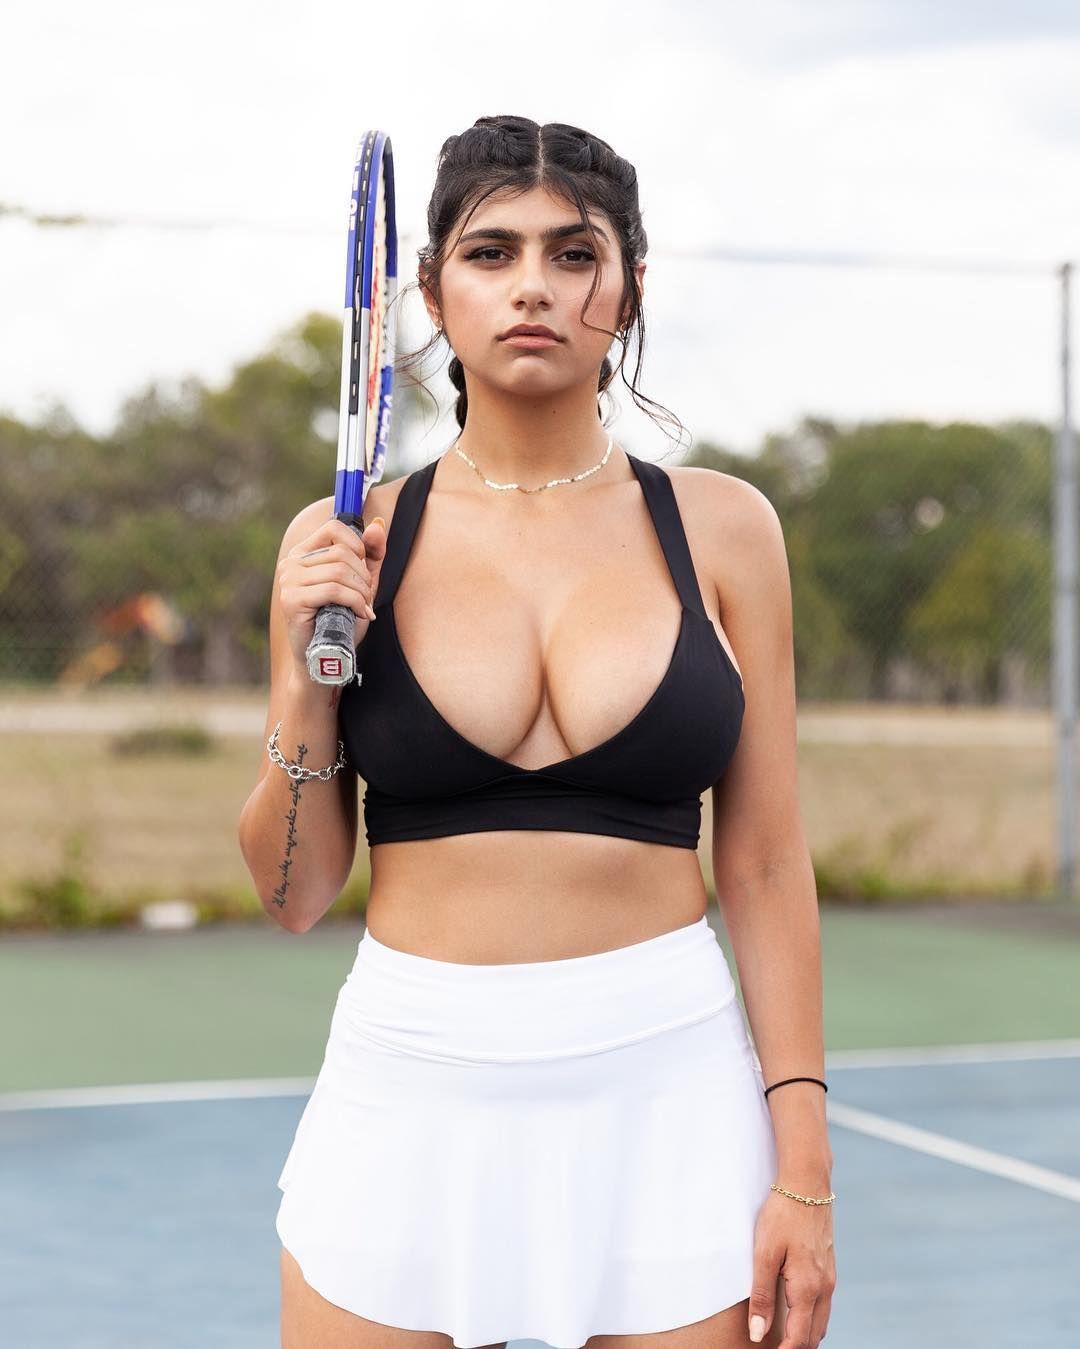 Mia sexy Mia Khalifa